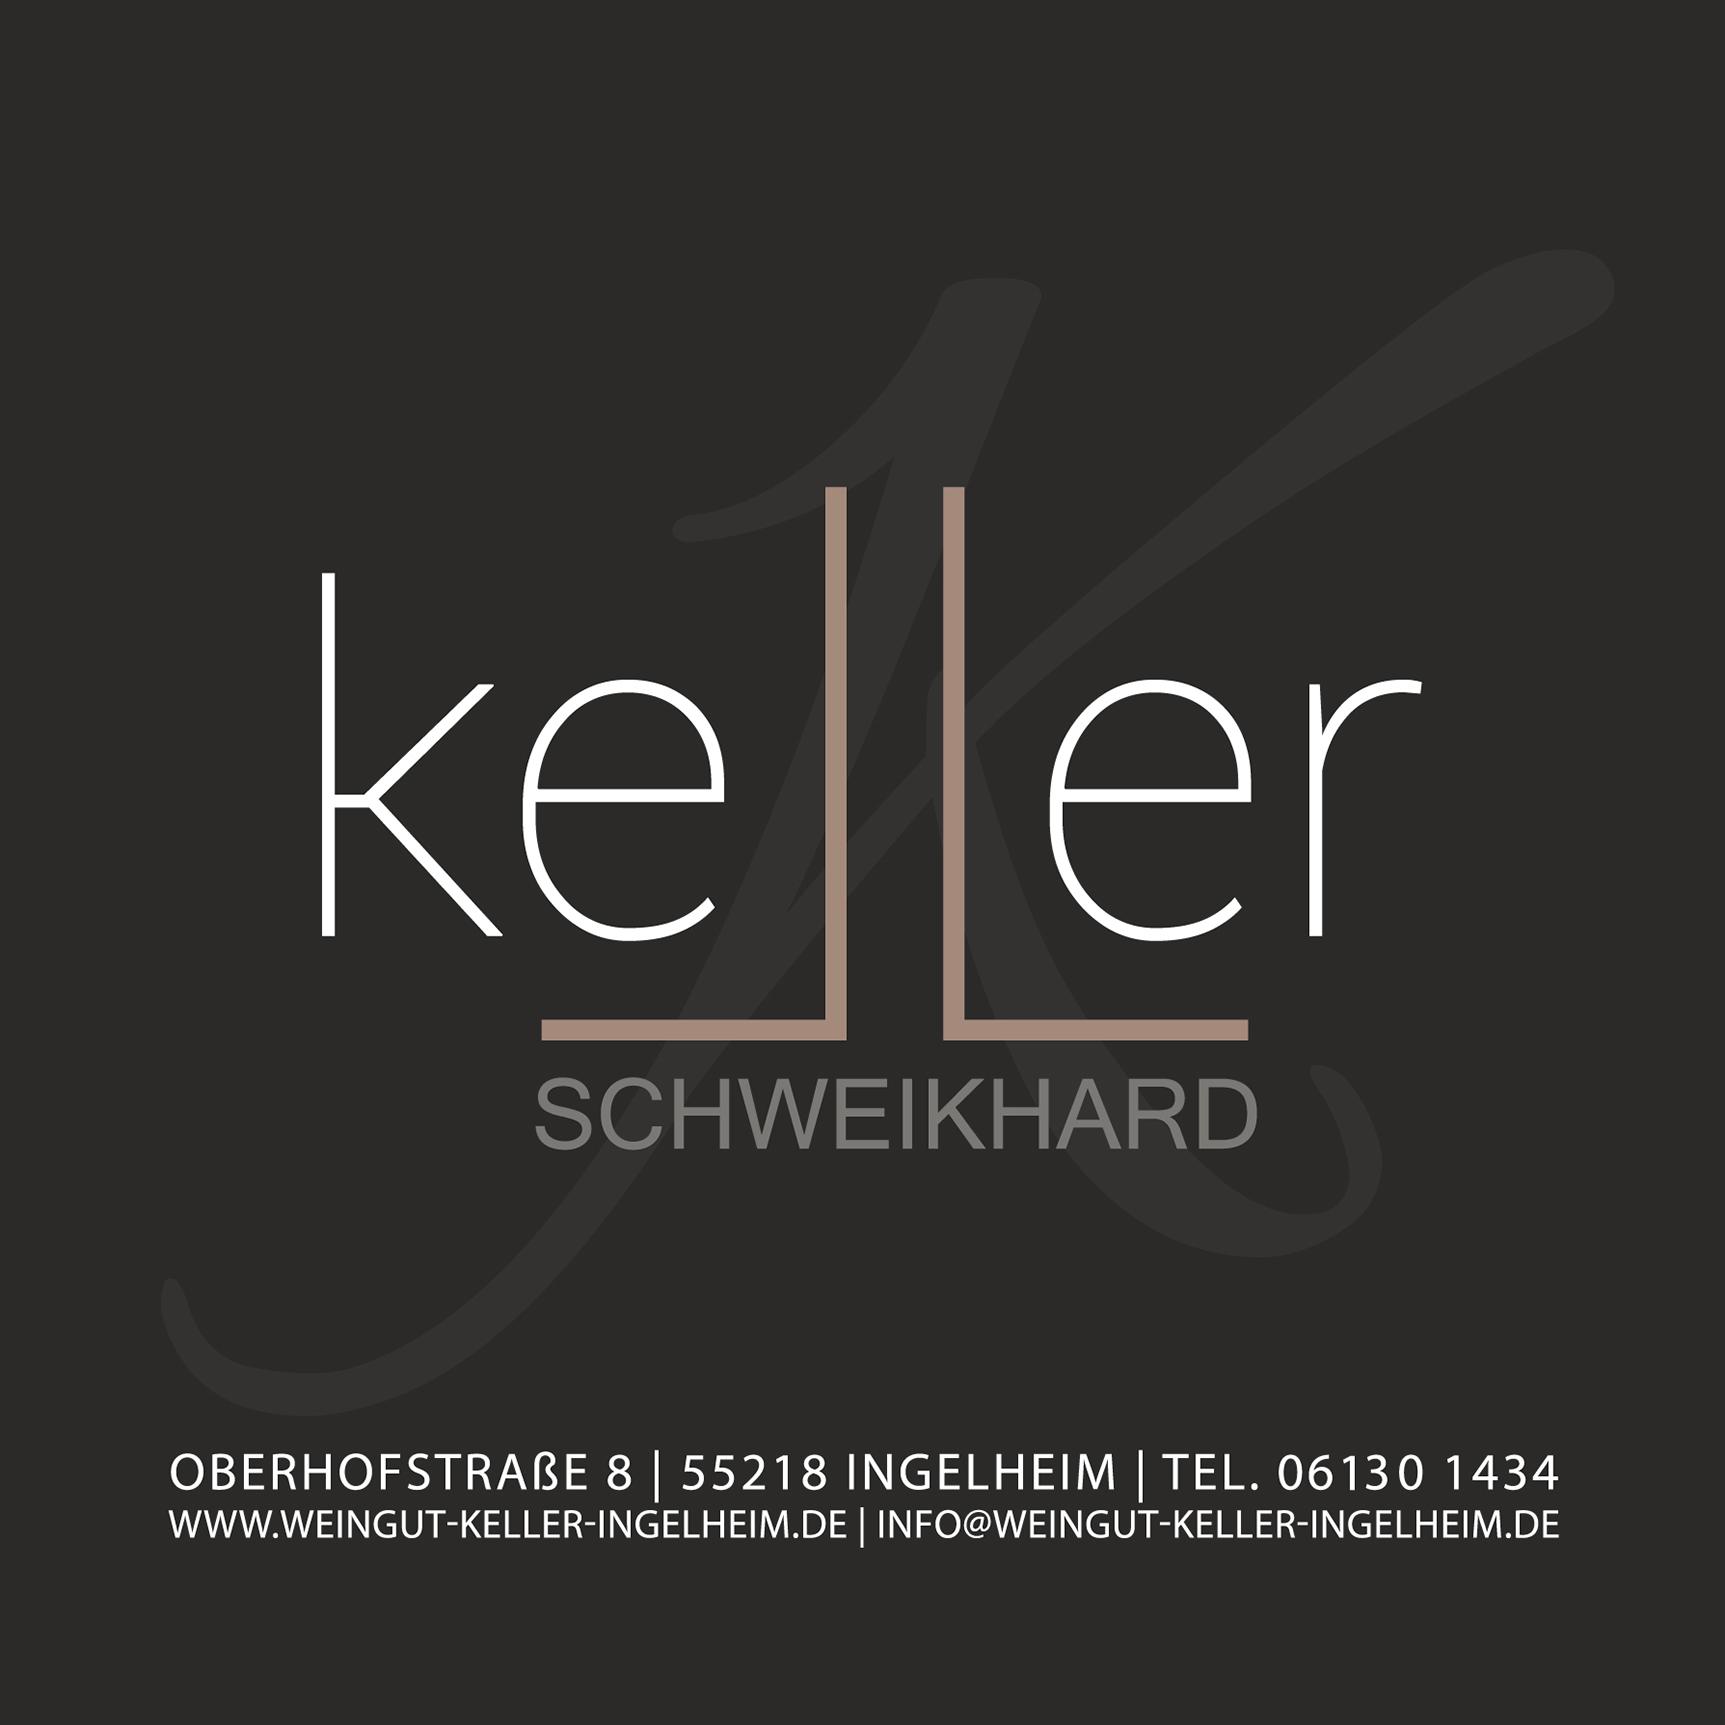 Onlineshop Weingut Keller